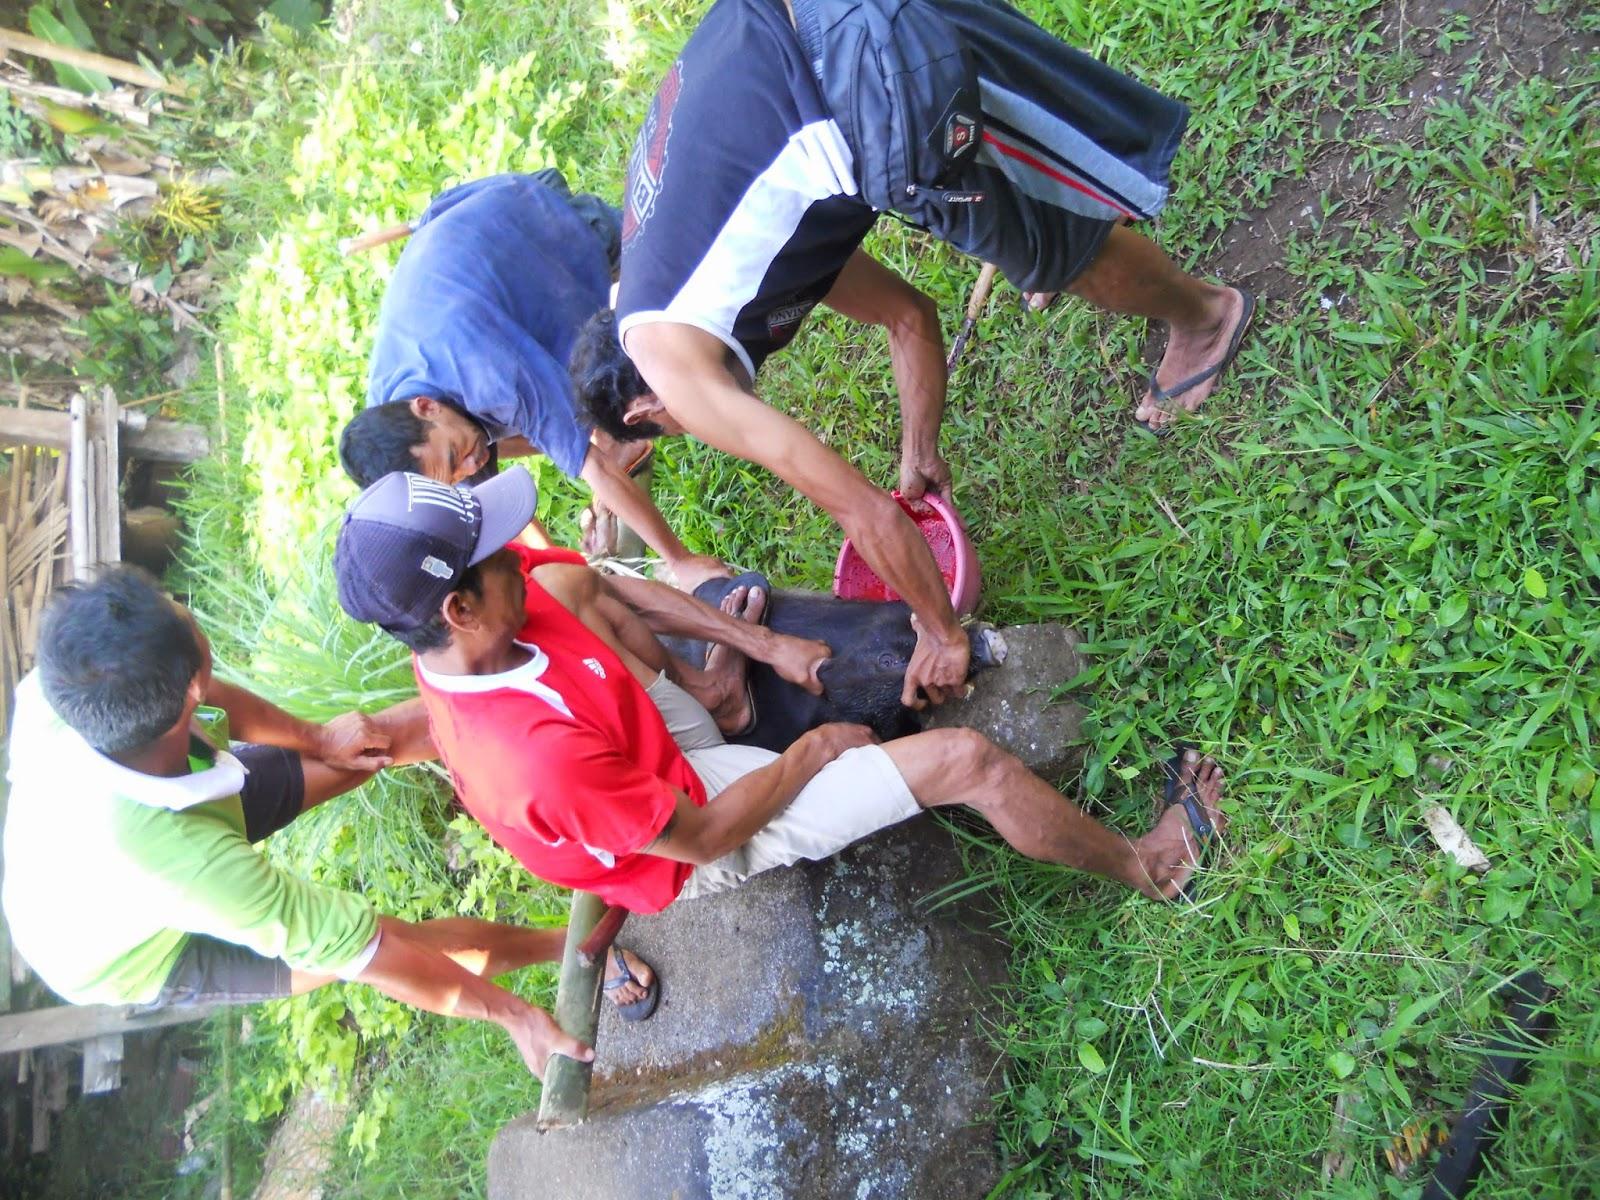 Punya www.madebayu.blogspot.com